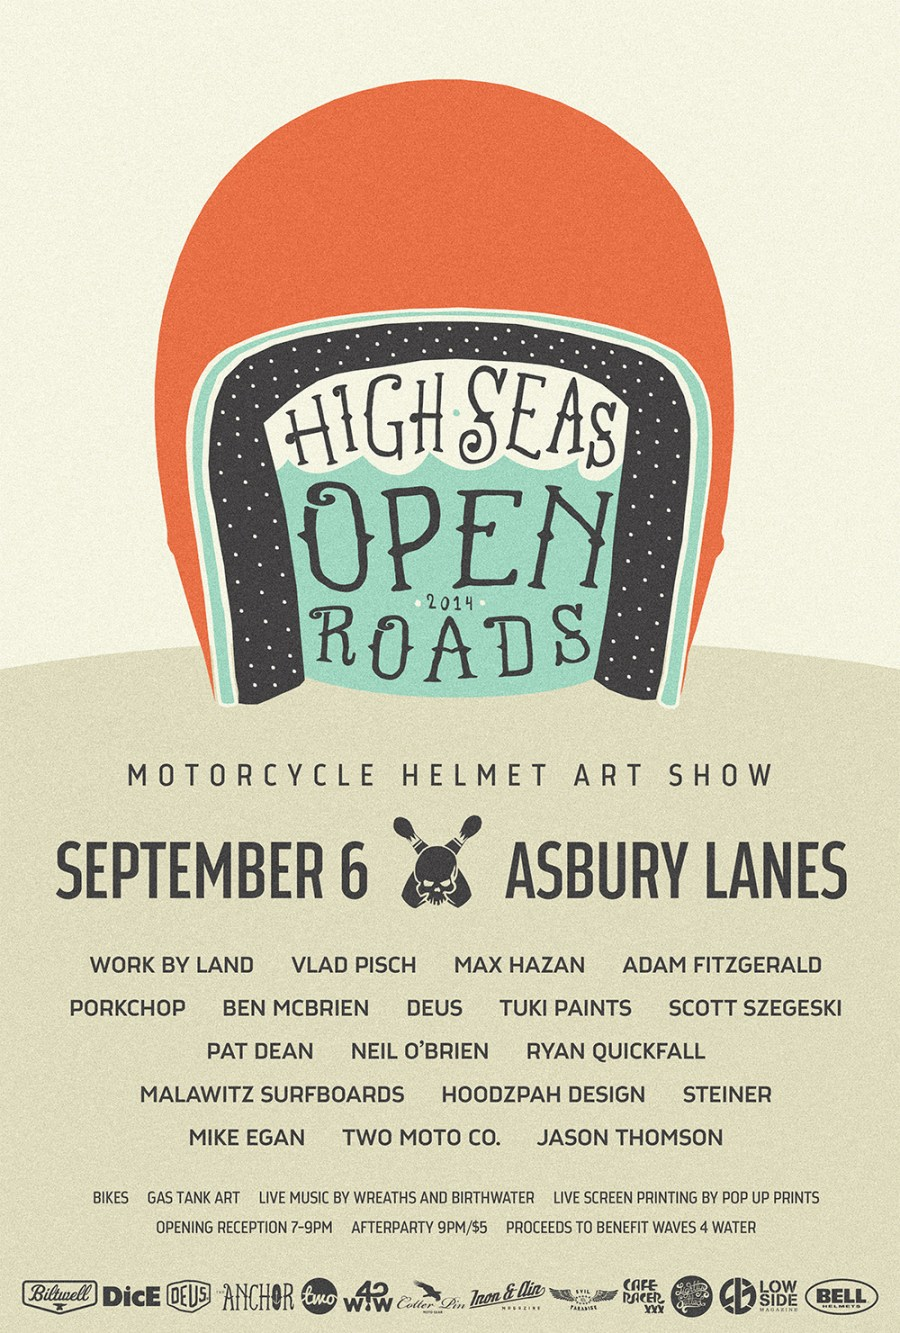 high seas open roads 2014 event poster